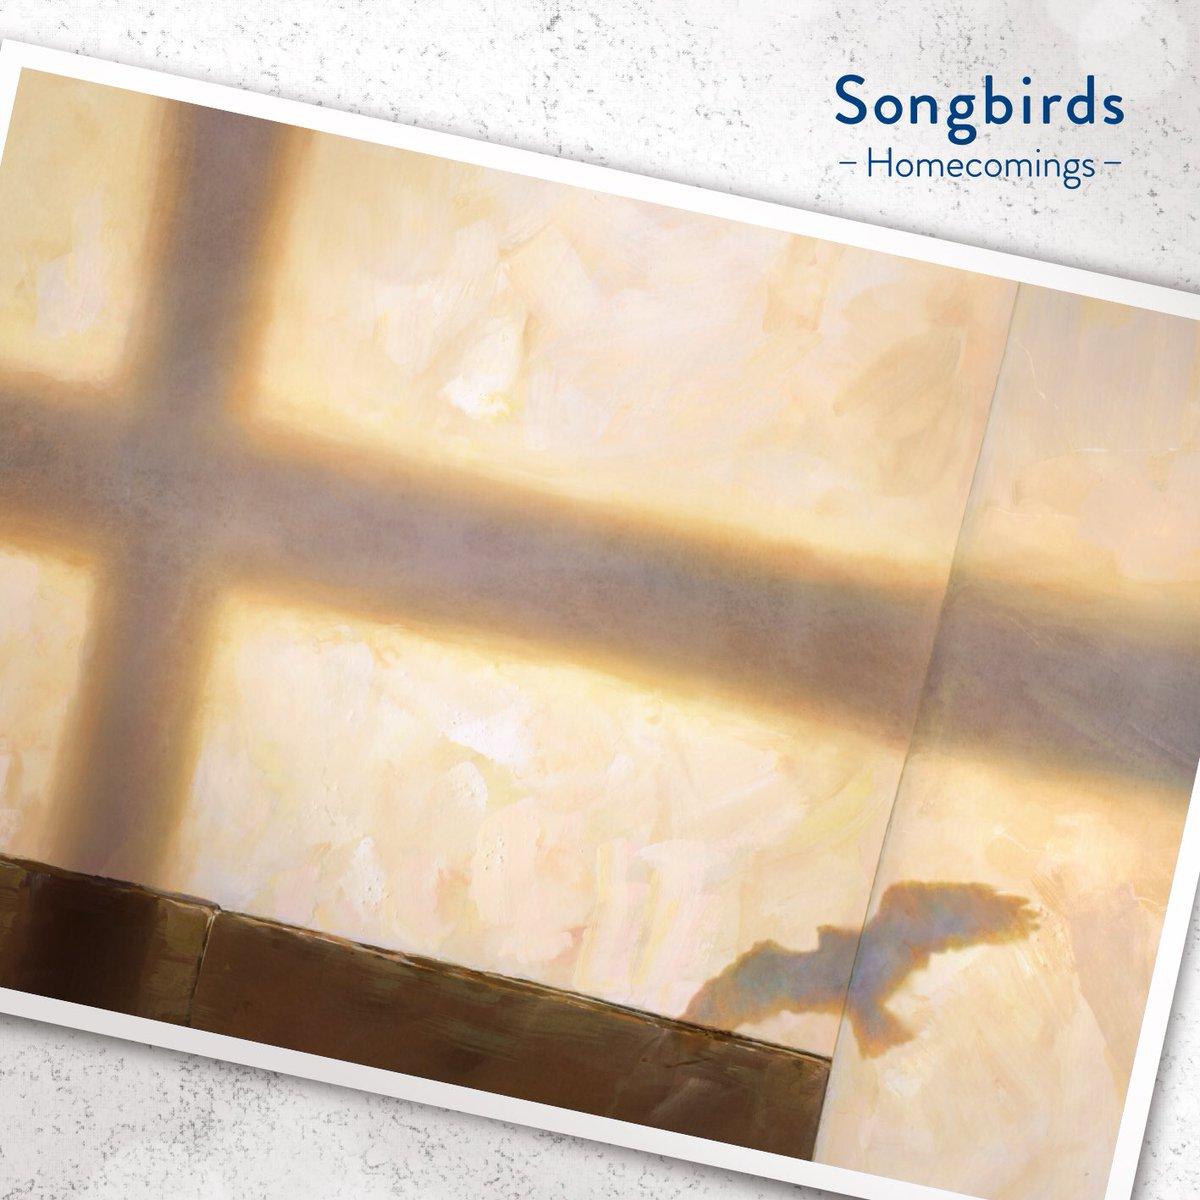 『Homecomings - Songbirds』収録の『Songbirds』ジャケット